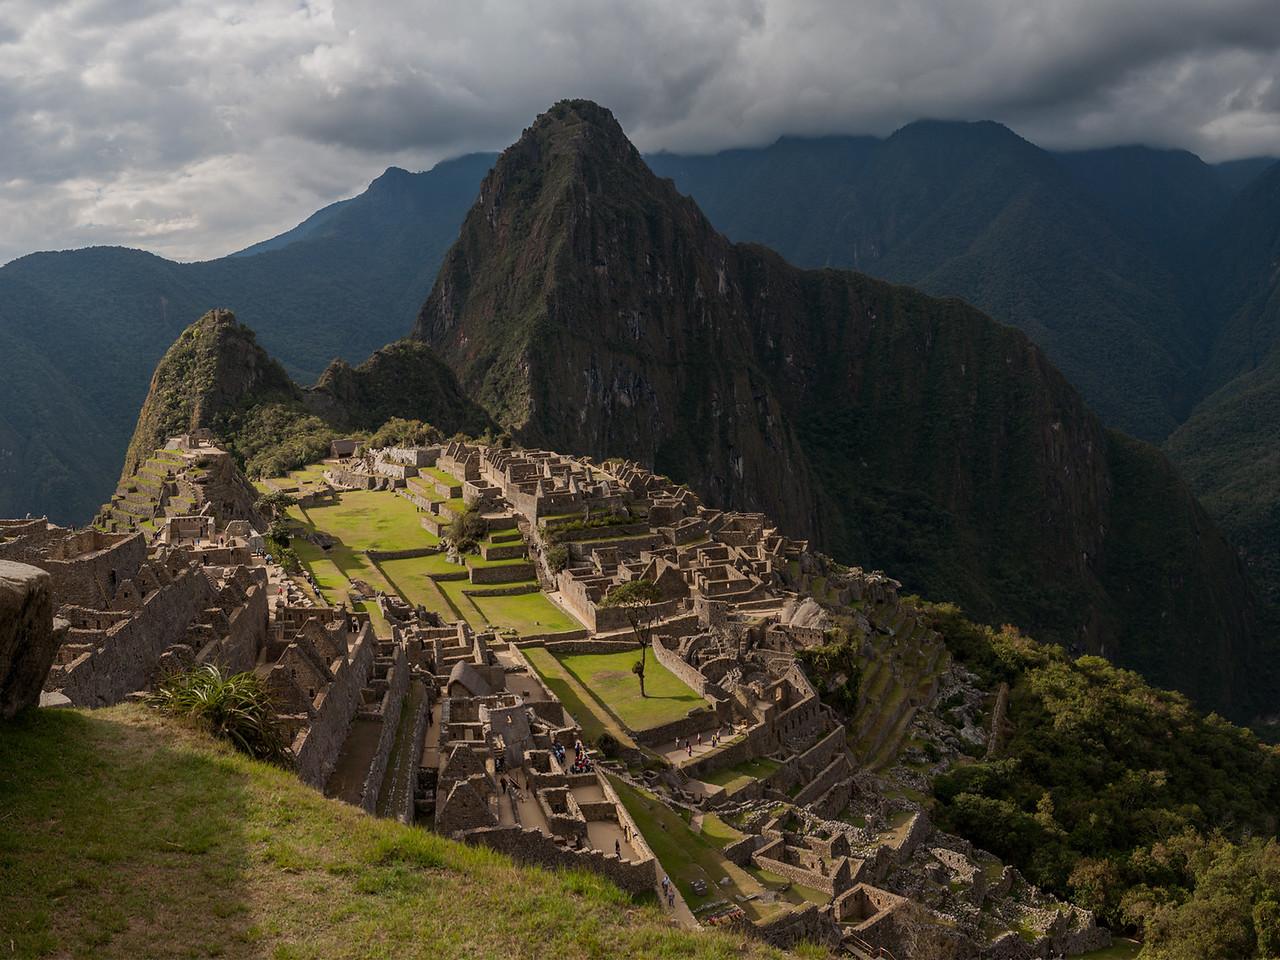 Machu Picchu set against the backdrop of Huayna Picchu